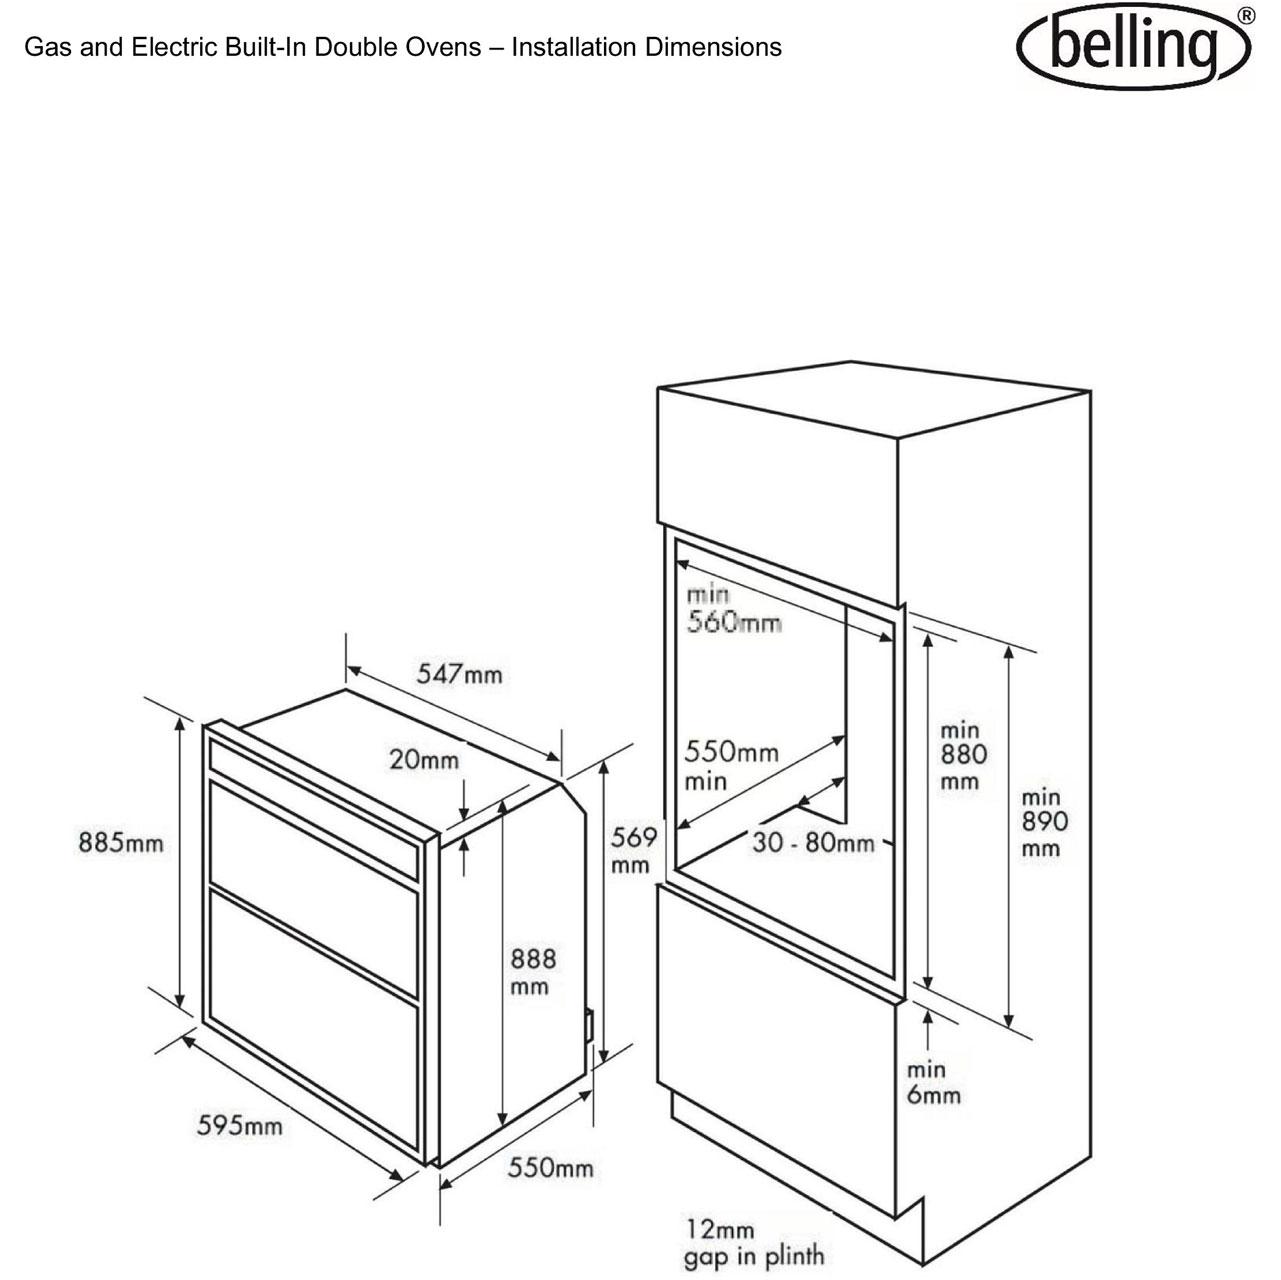 bi90fp_bk_belling_doubleoven_dim_l belling bi90fp built in double oven stainless steel belling cooker wiring diagram at creativeand.co